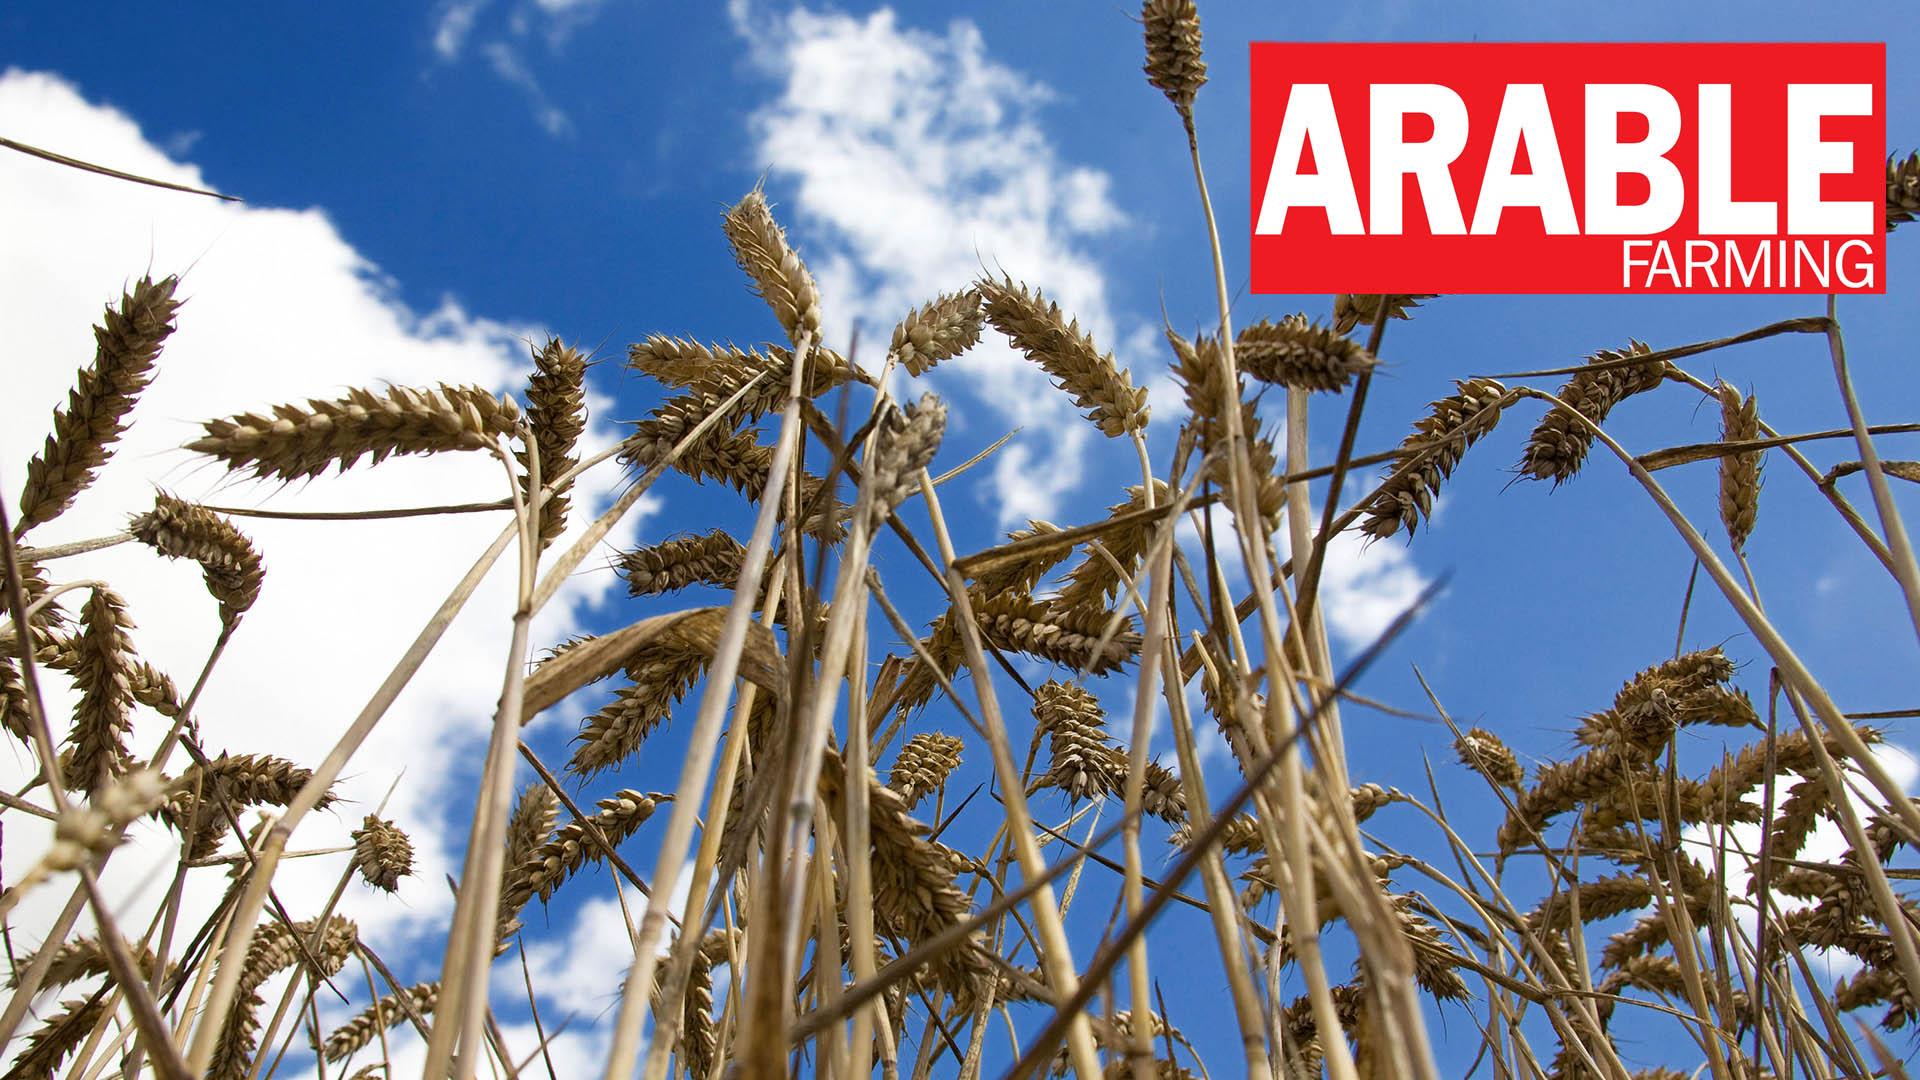 Arable Farming